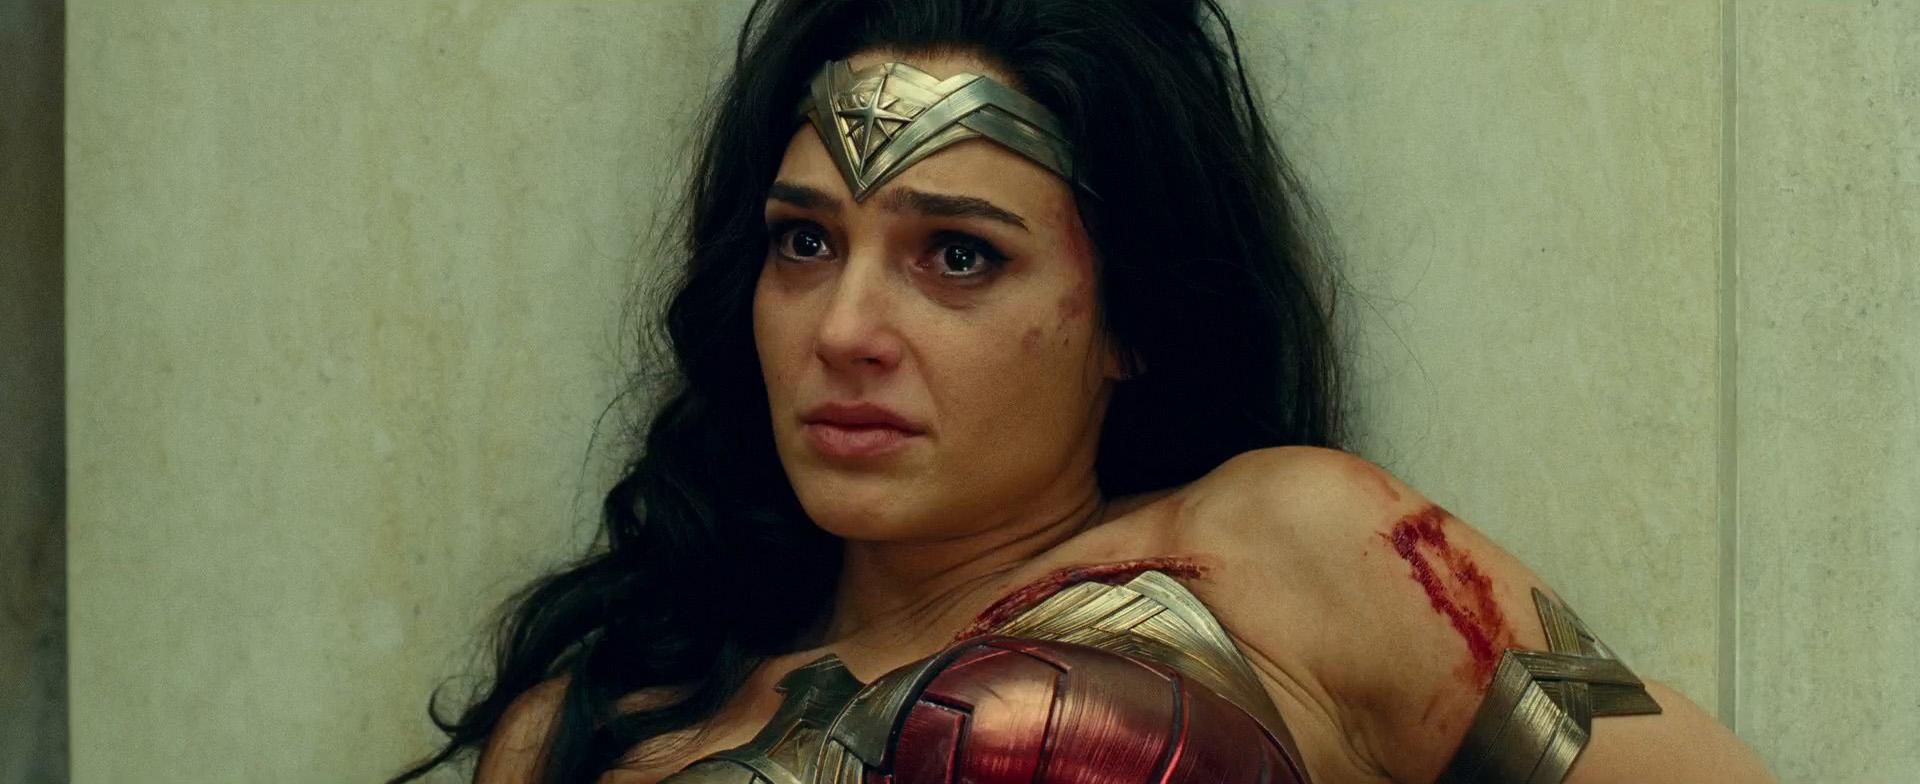 Wonder Woman 1984 | 2021 | IMAX | BDRip | XviD | Türkçe Dublaj | 4K - 3D - 720p - 1080p - m720p - m1080p | BluRay | Dual | TR-EN | Tek Link